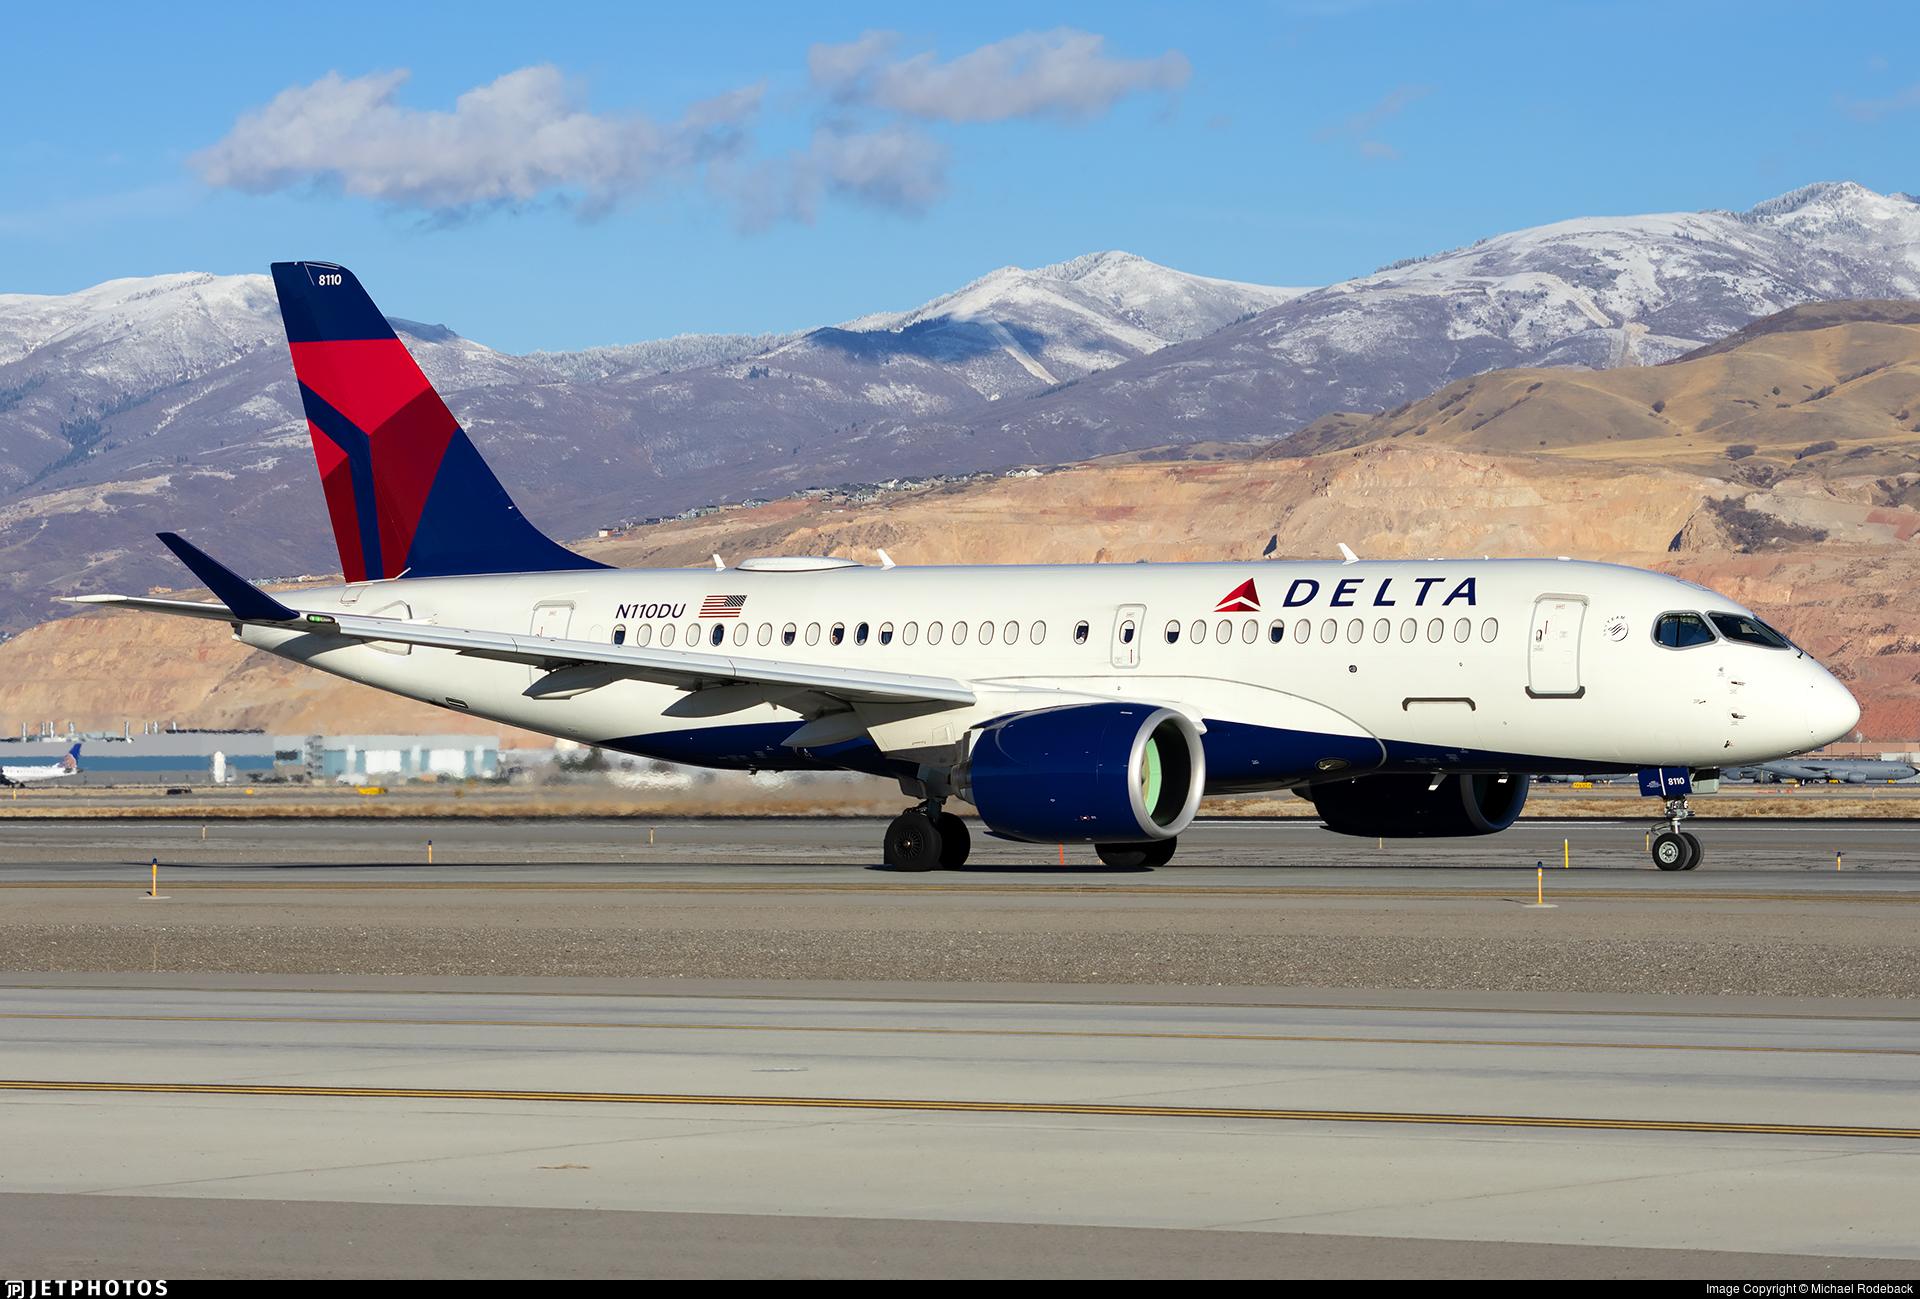 N110DU - Bombardier CSeries CS100  - Delta Air Lines